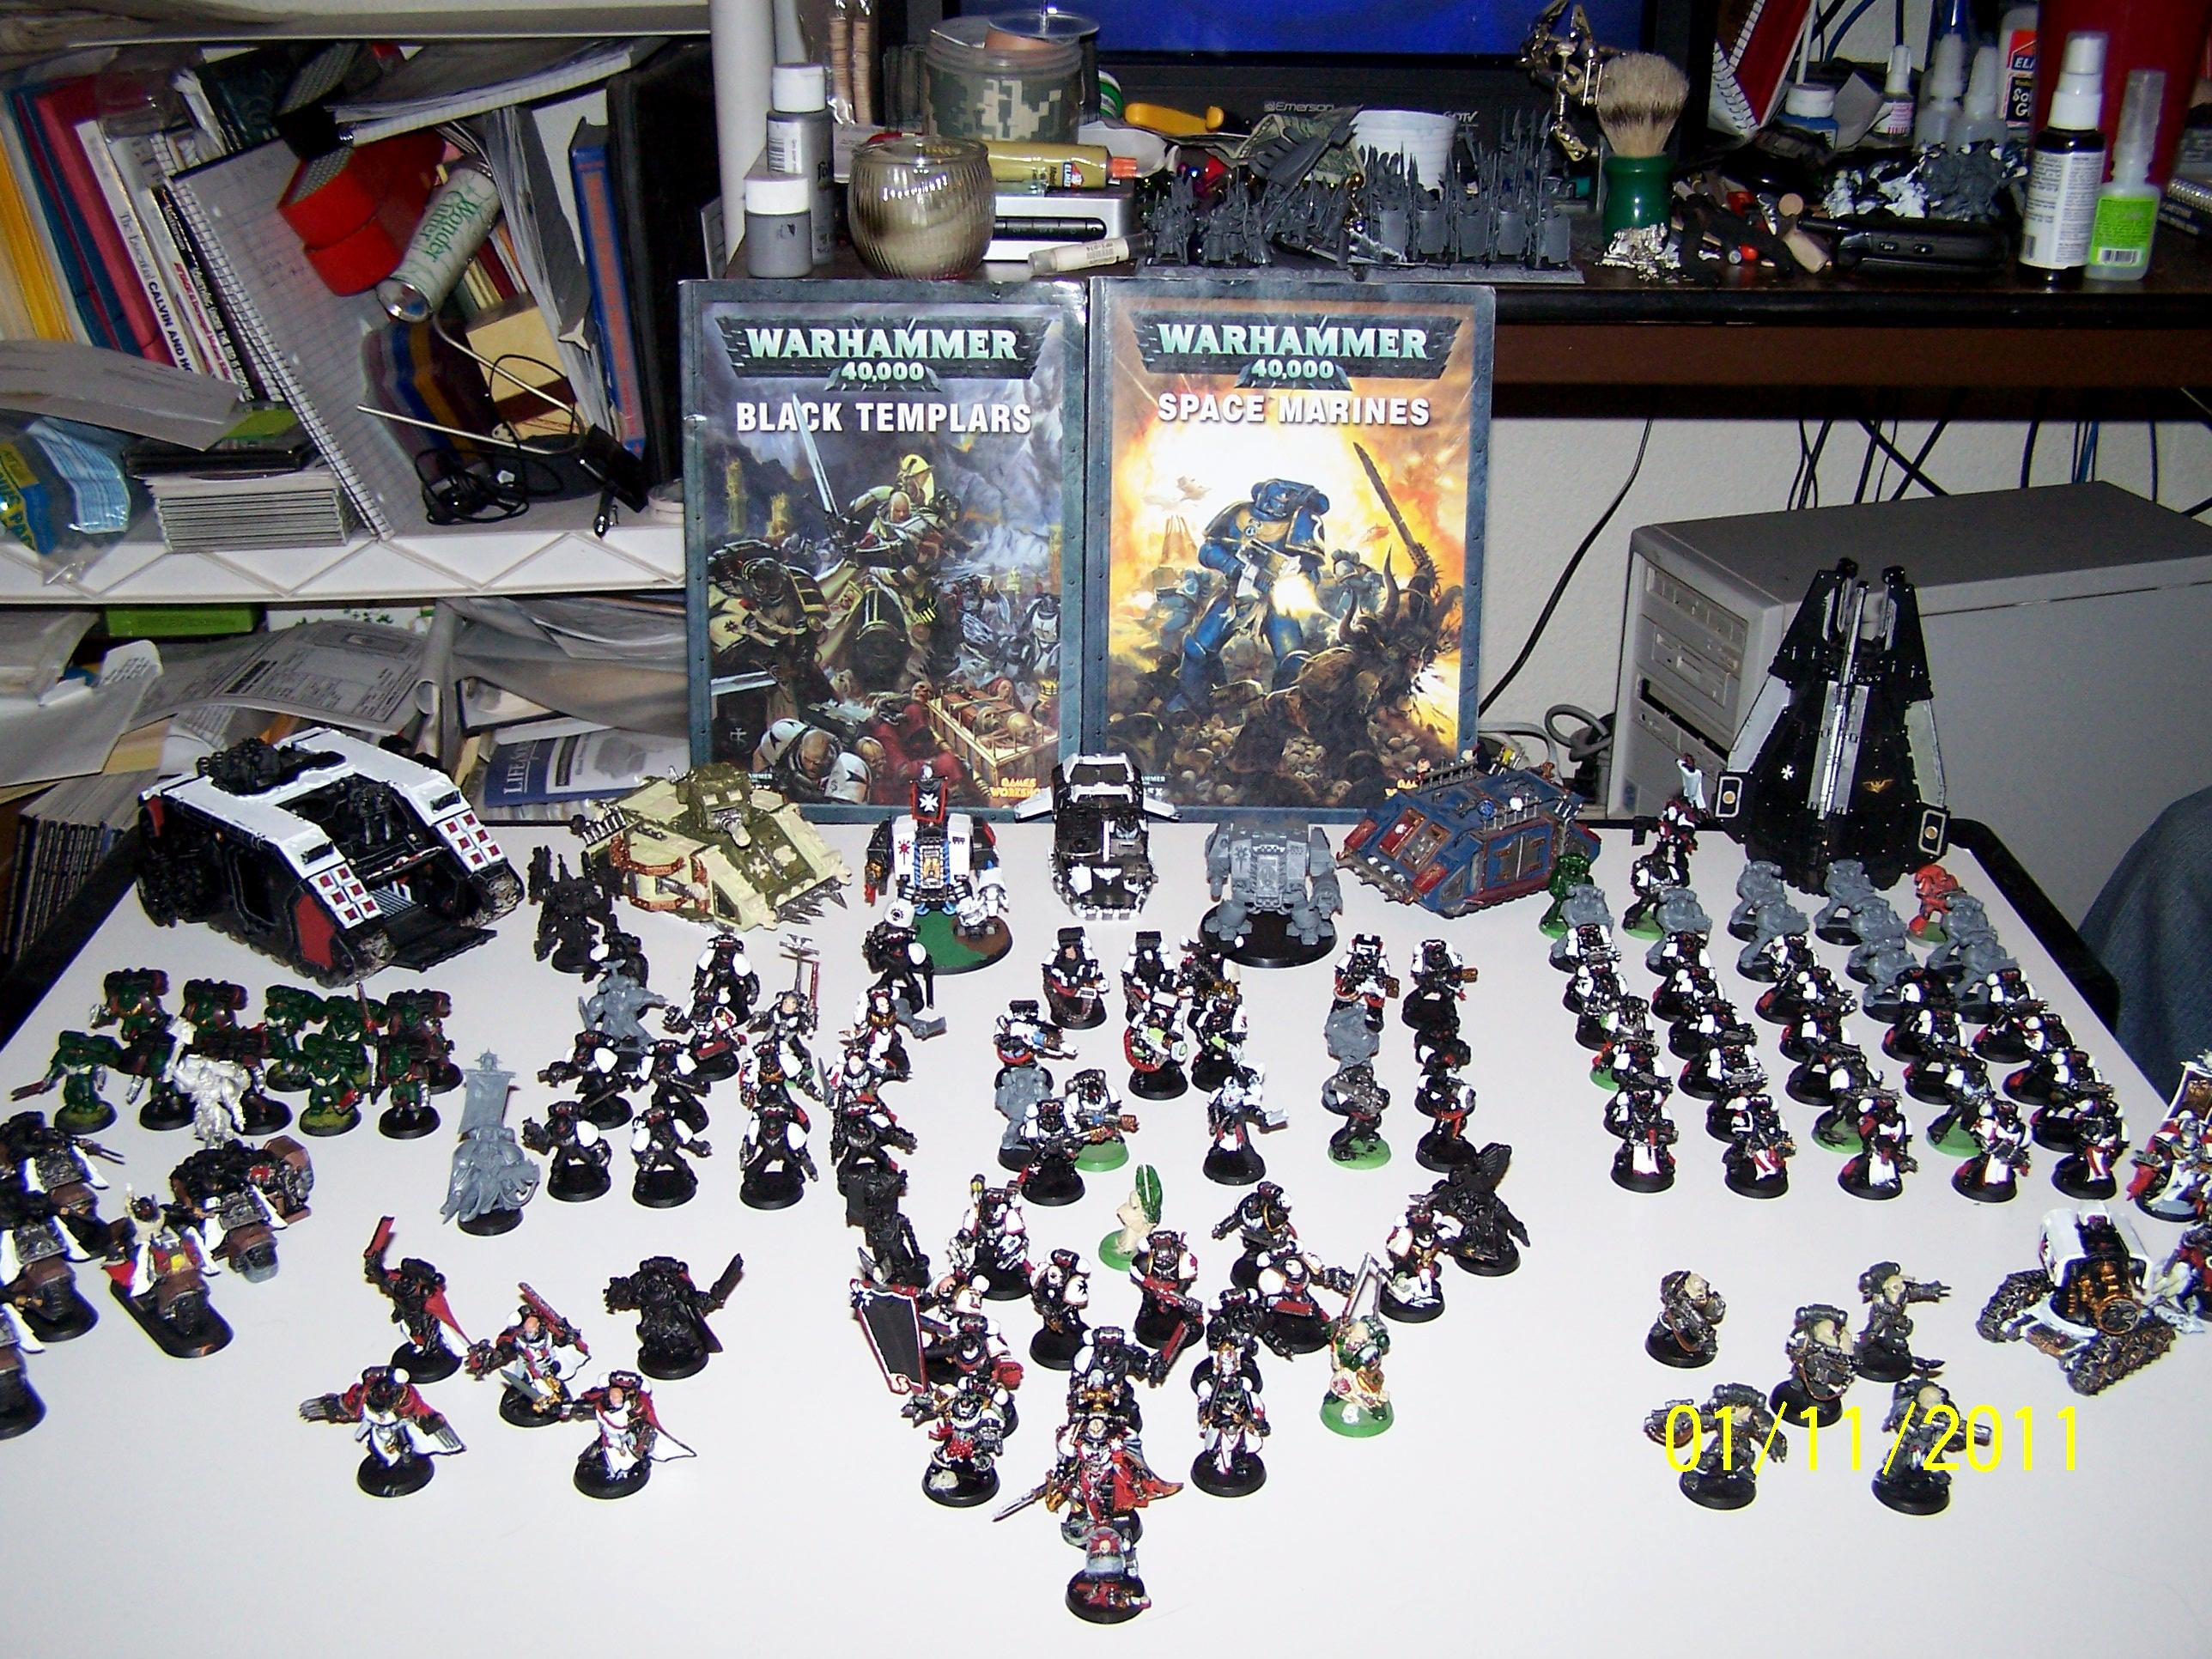 Black Templars, Space Marines